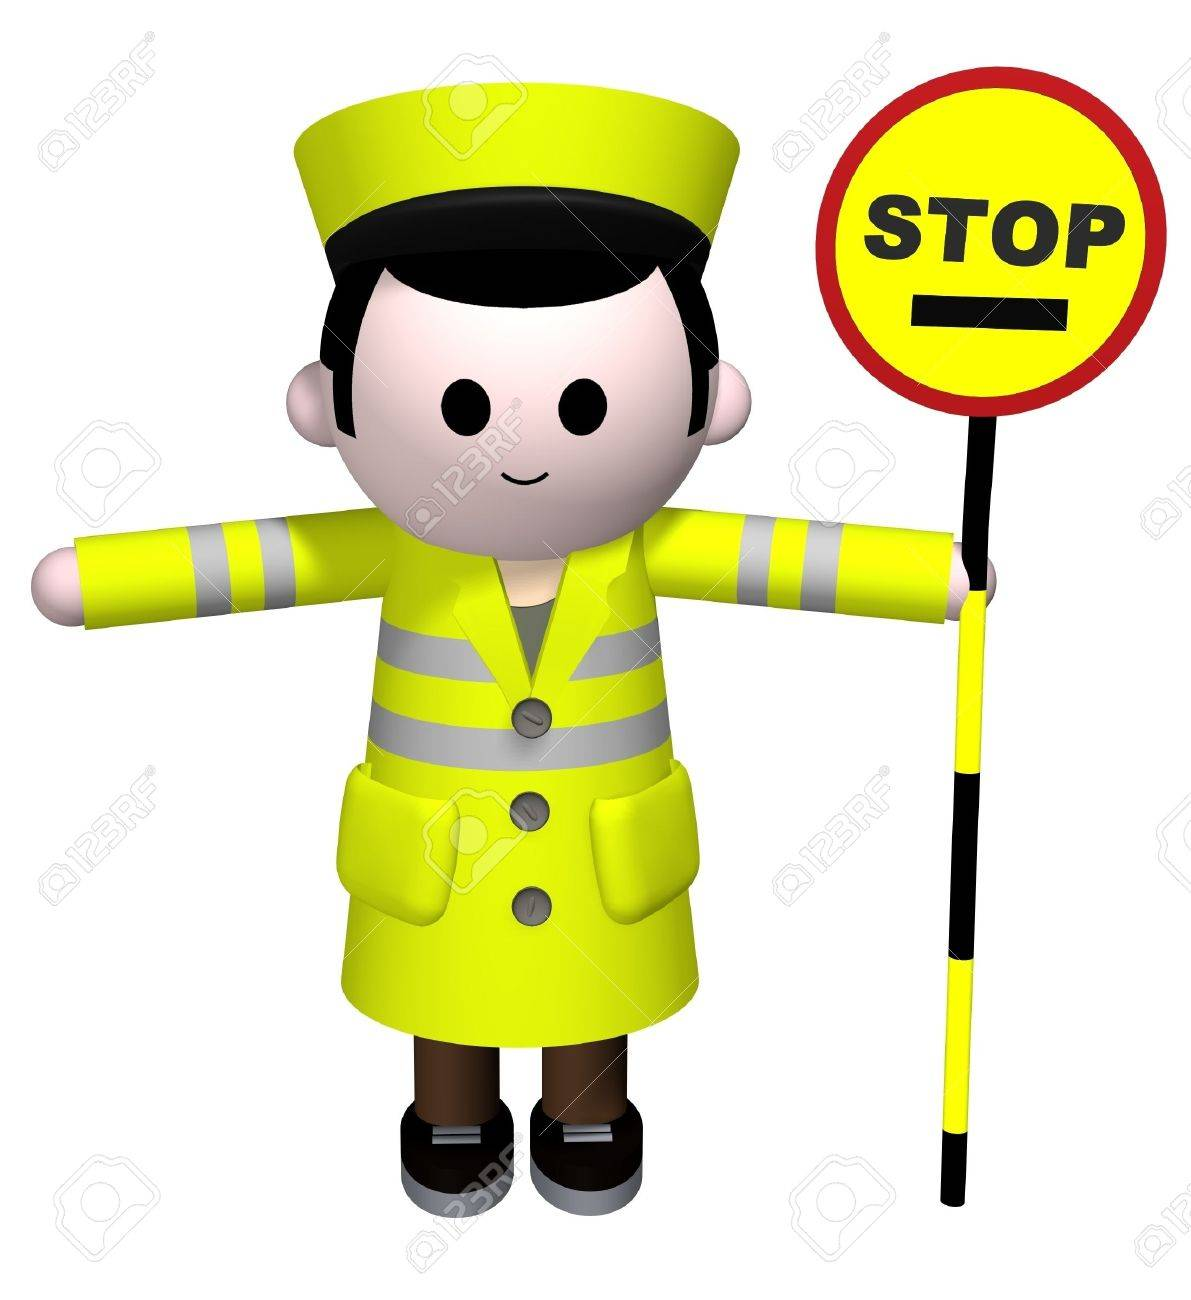 3D illustration of a lollipop manholding a stop sign Stock Illustration - 2806177